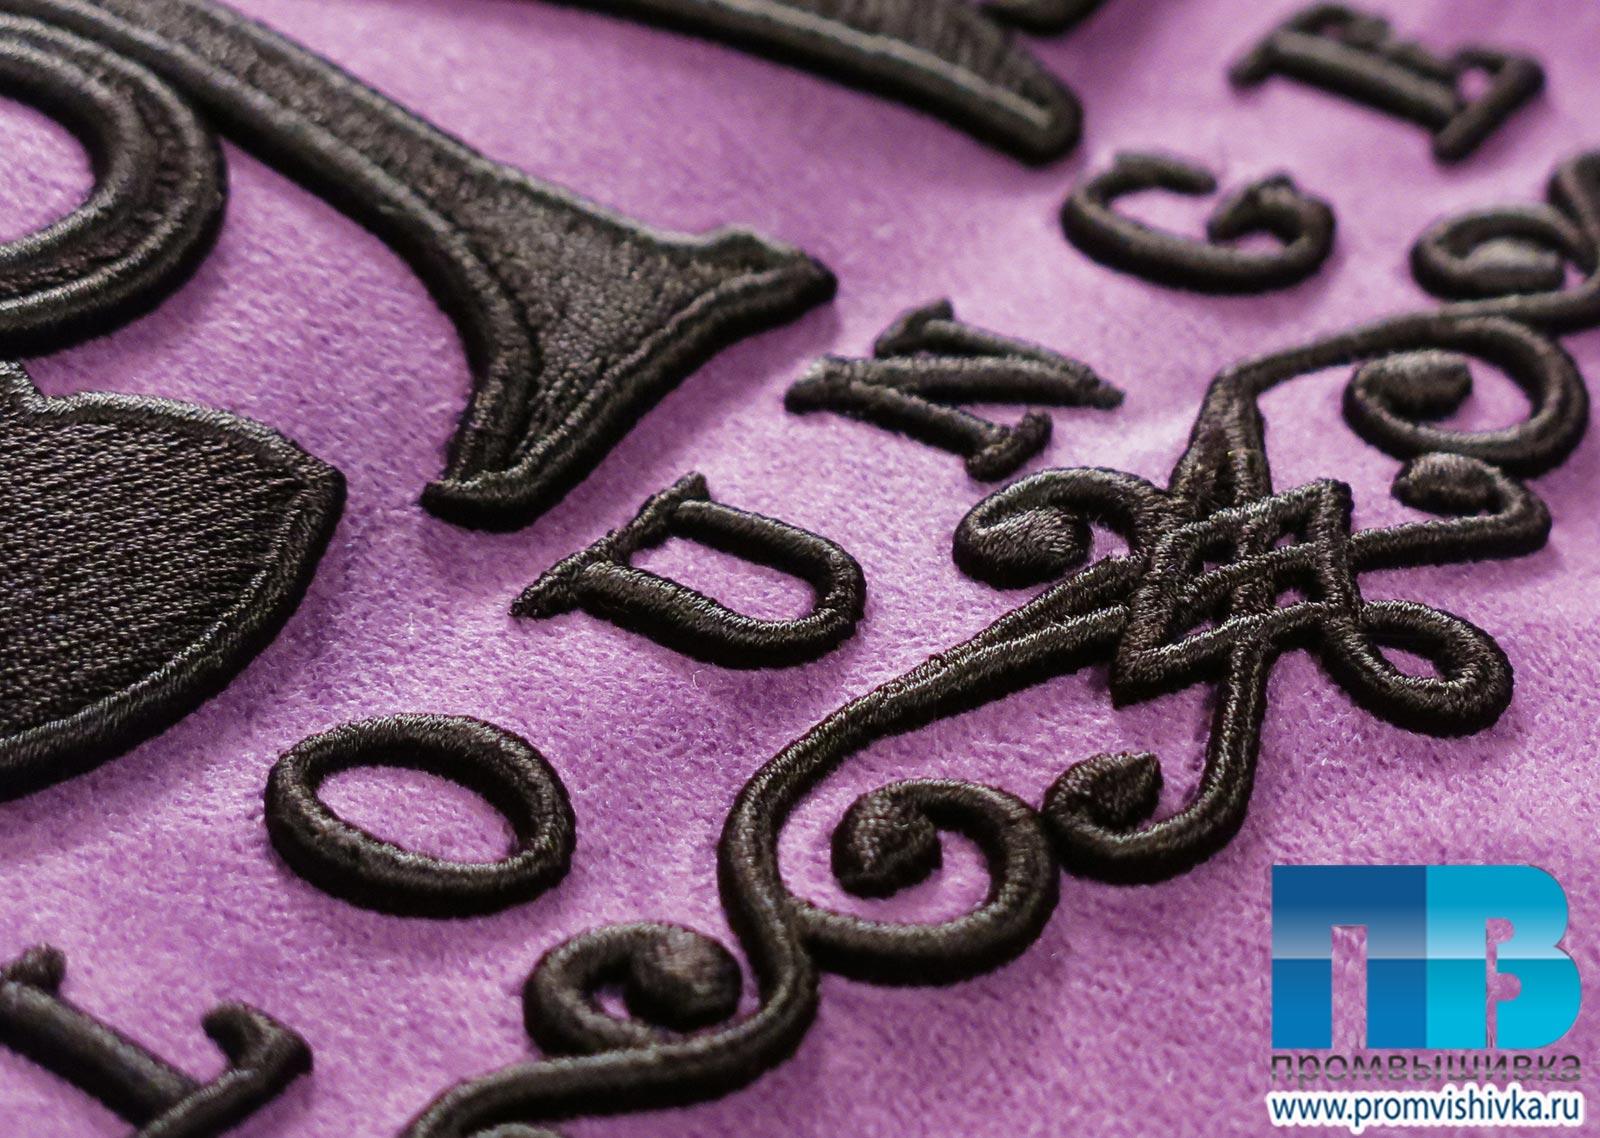 Вышивка по ткани производство